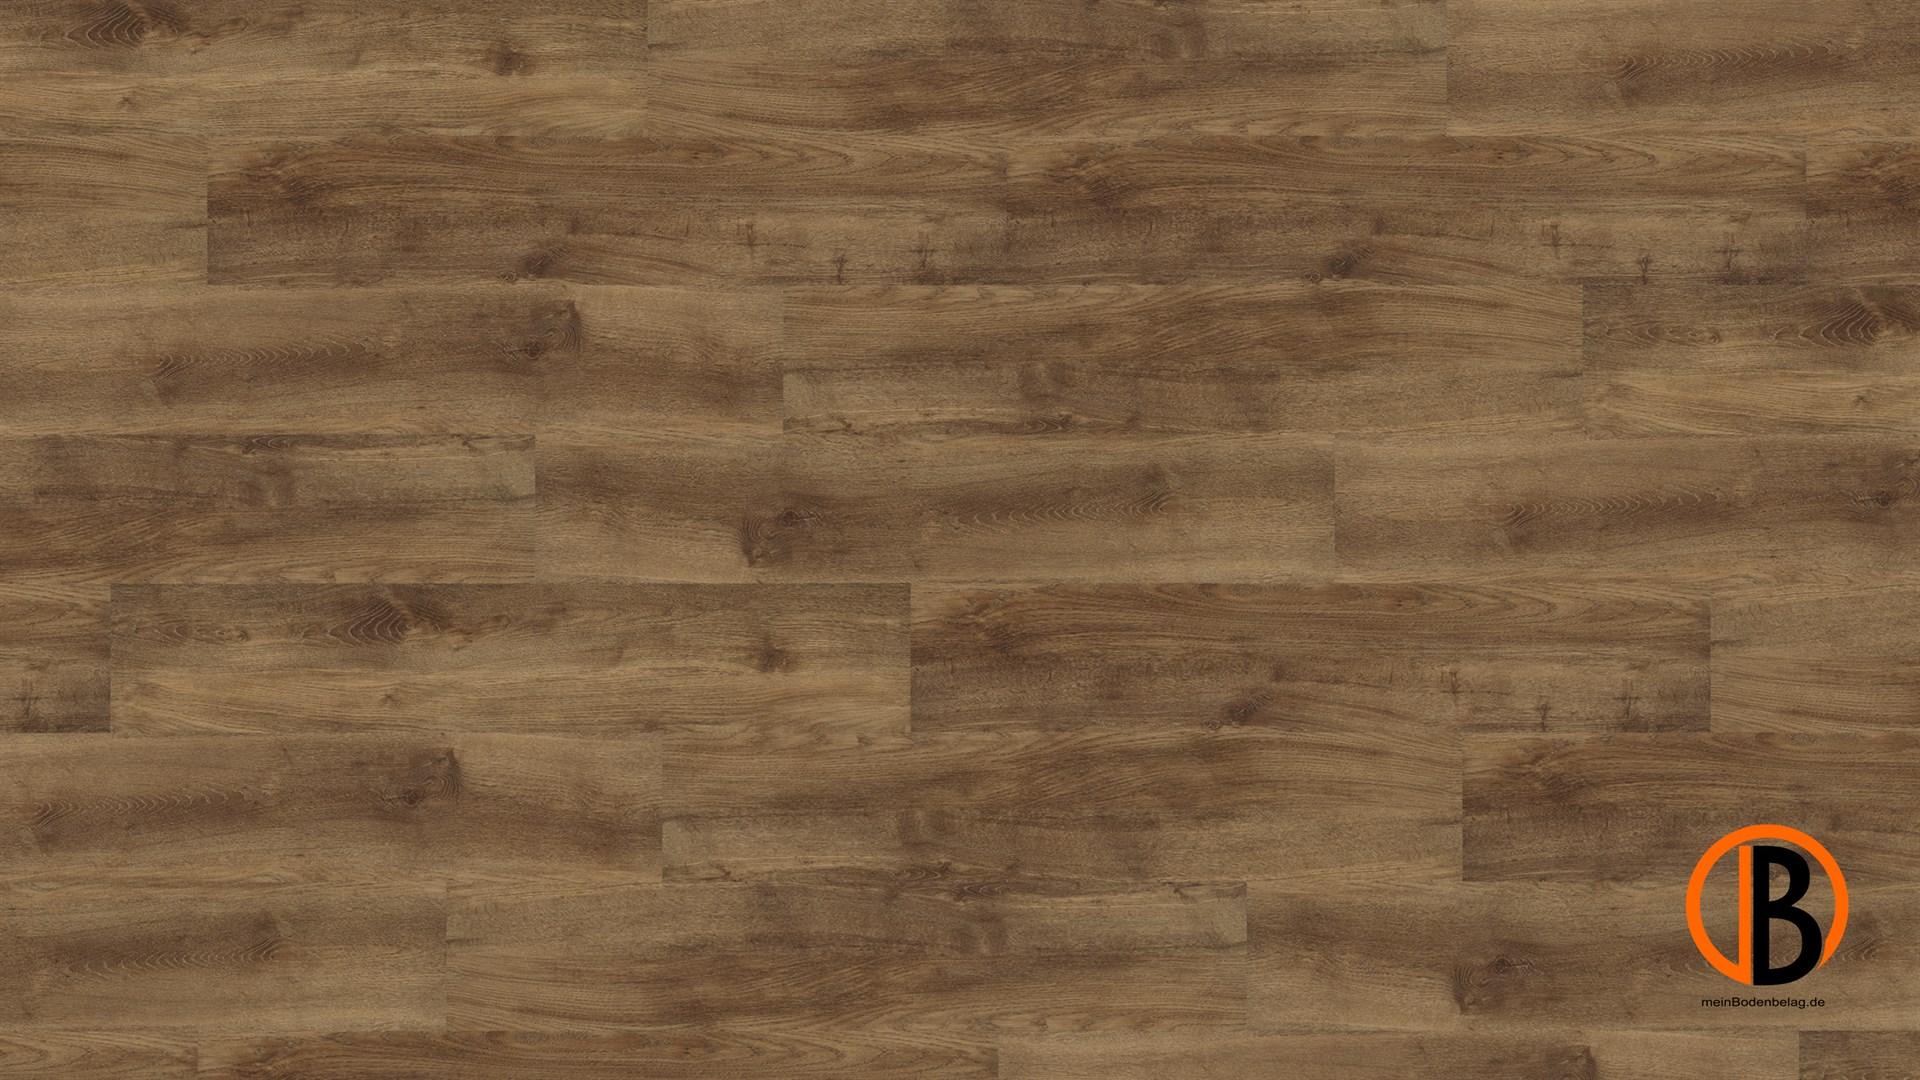 CINQUE KWG DESIGNBODEN ANTIGUA GREEN, PVC-FREI | 10000292;0 | Bild 1